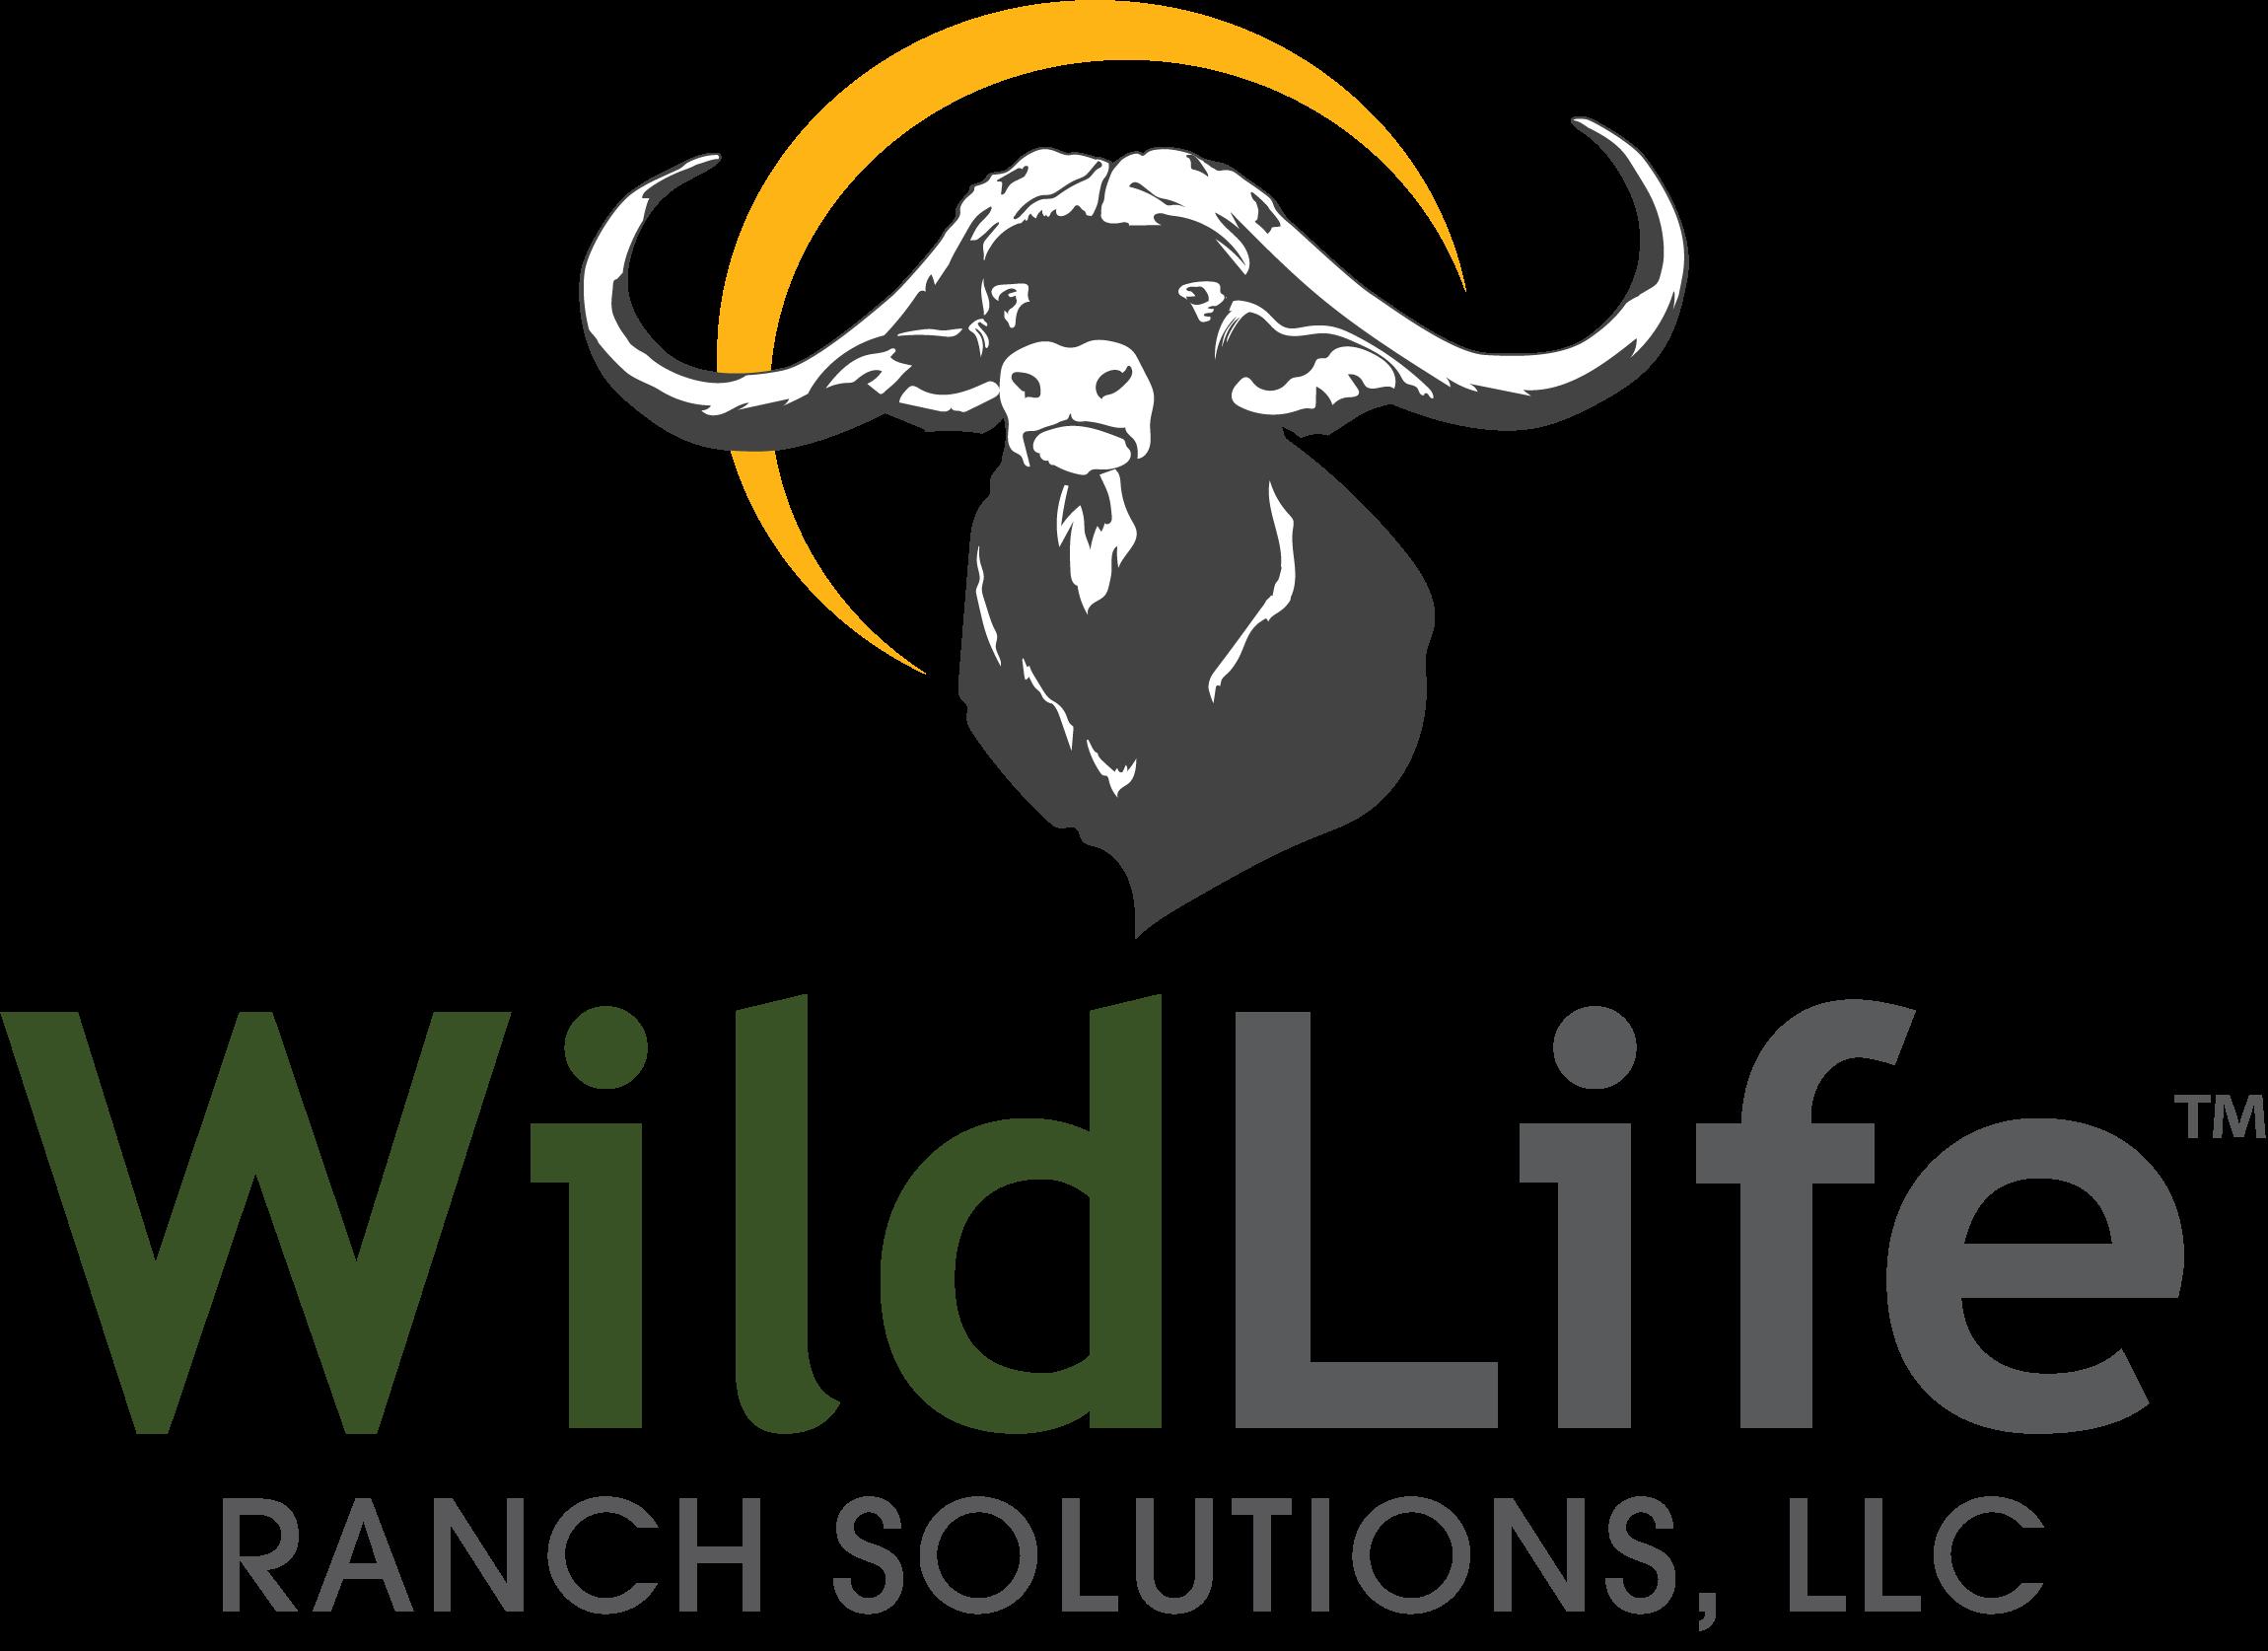 WildLife Ranch Solutions